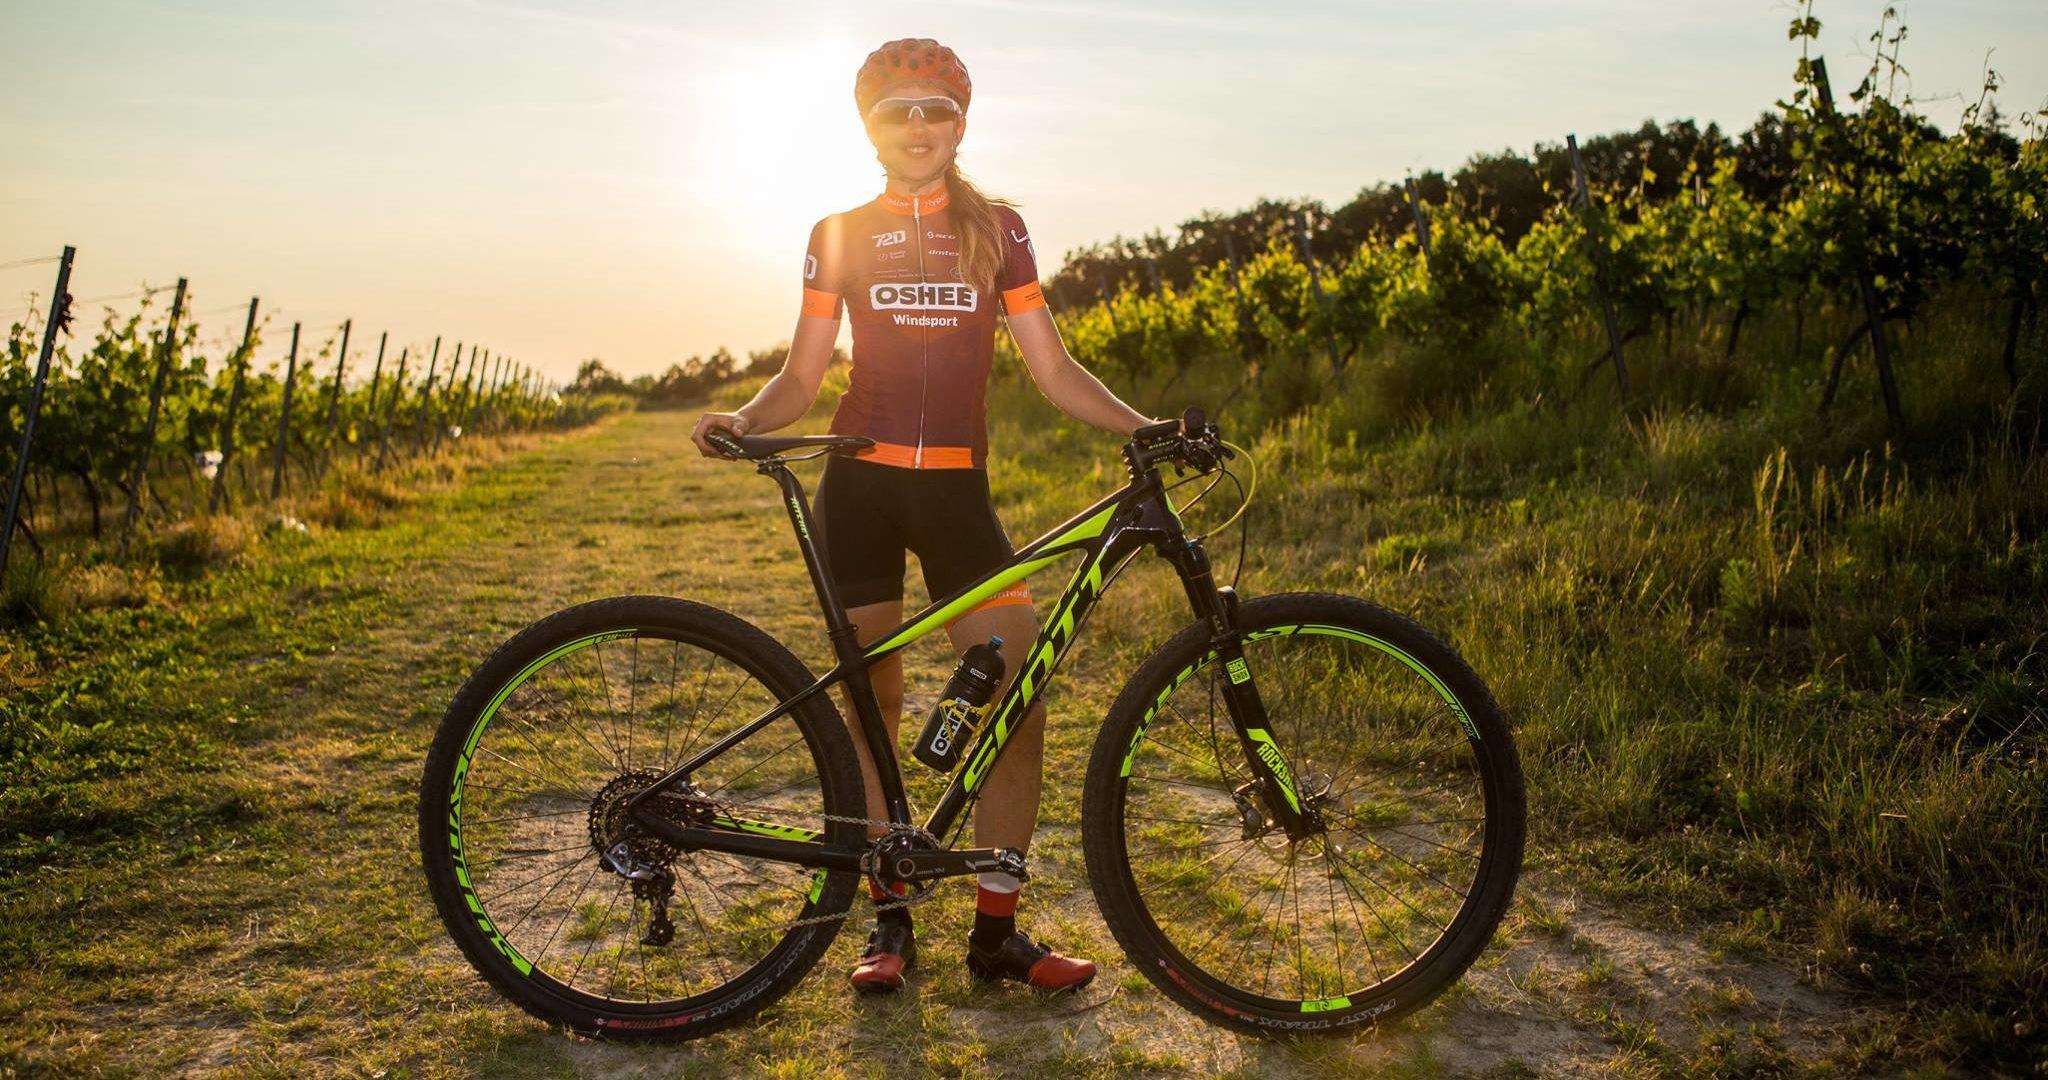 Karolina Sowa (72D Windsport powered by Oshee) – Podsumowanie sezonu 2017